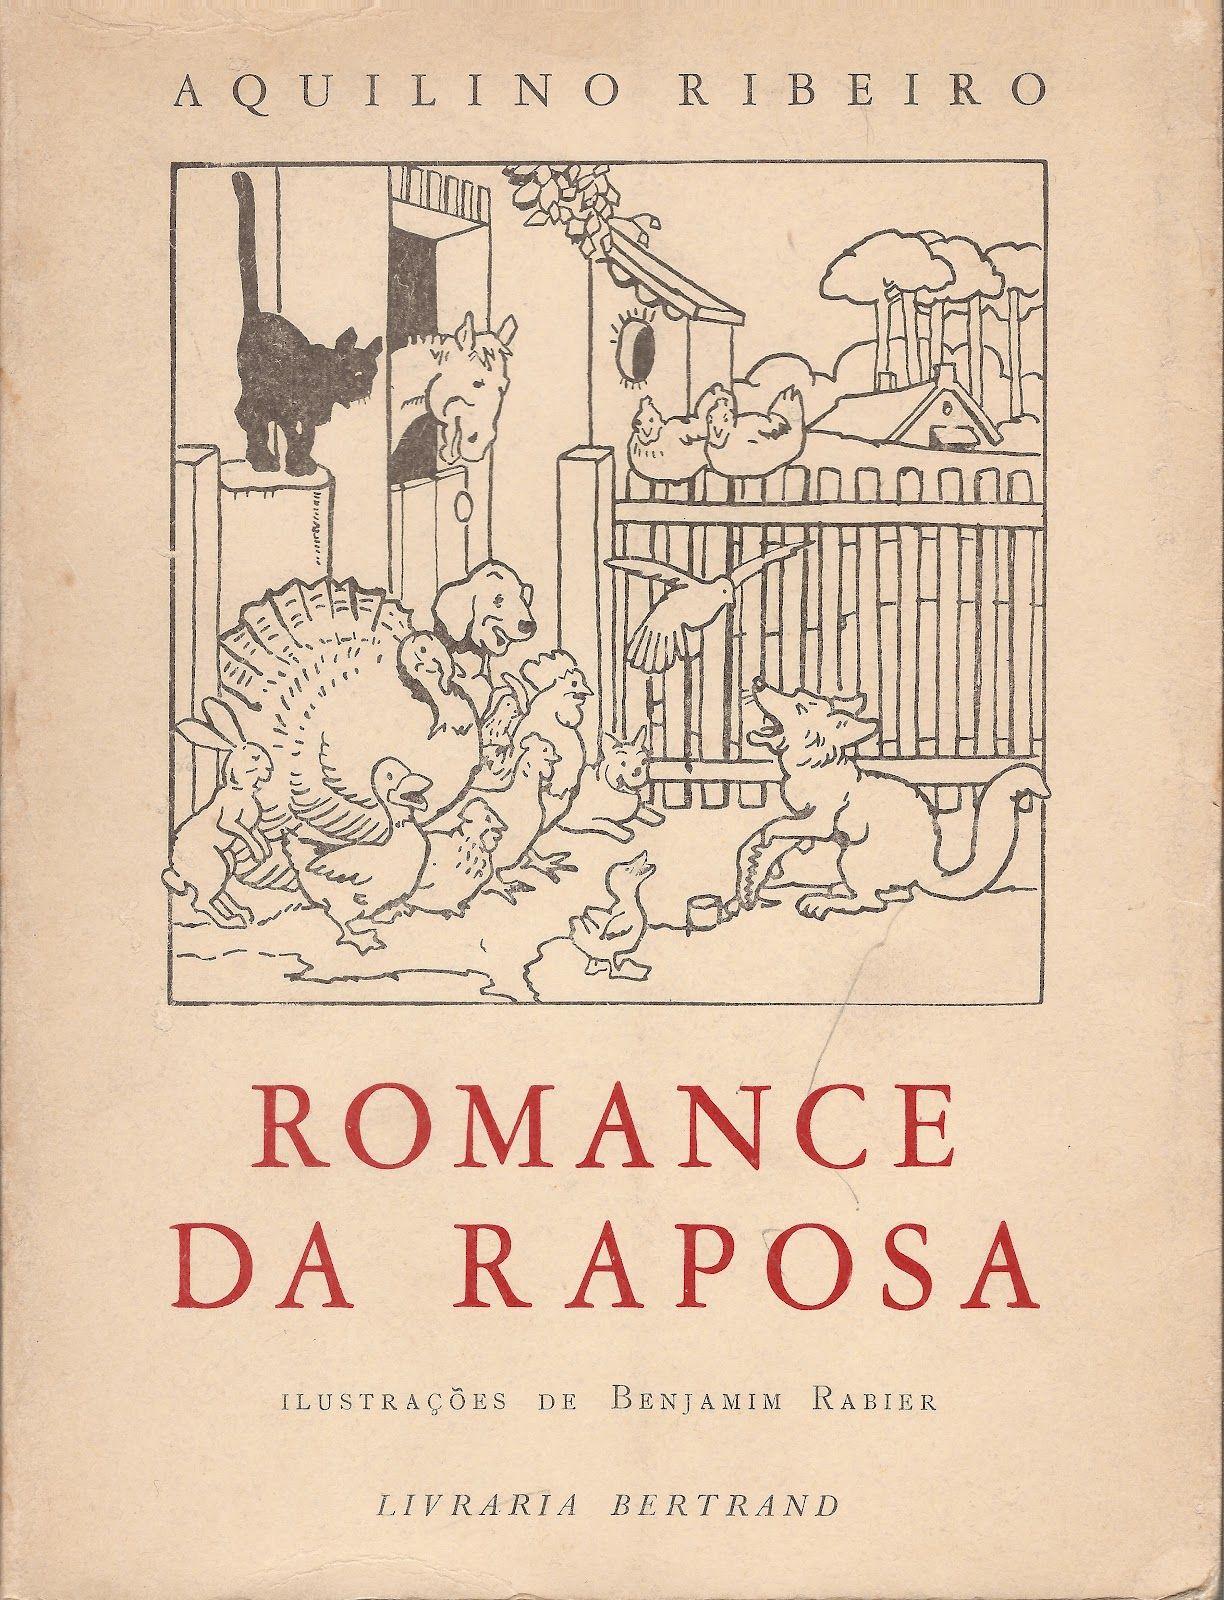 'Romance da Raposa', cover and illustration by Benjamim Rabier